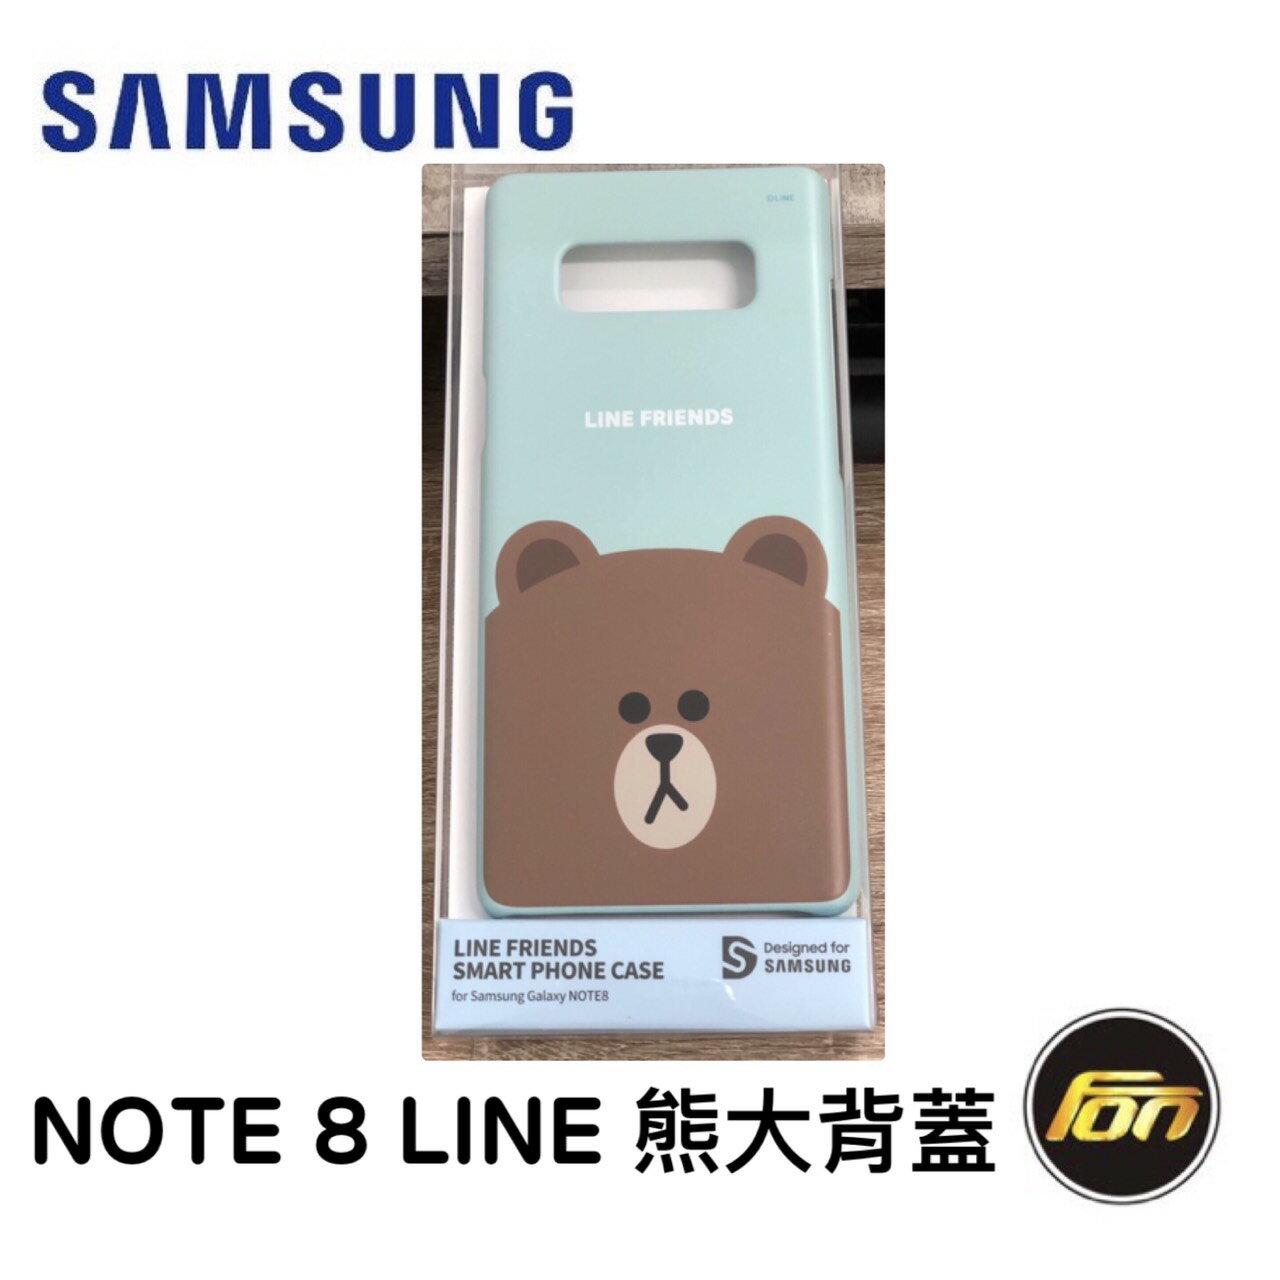 SAMSUNG NOTE 8 LINE熊大 背蓋 保護套 保護殼